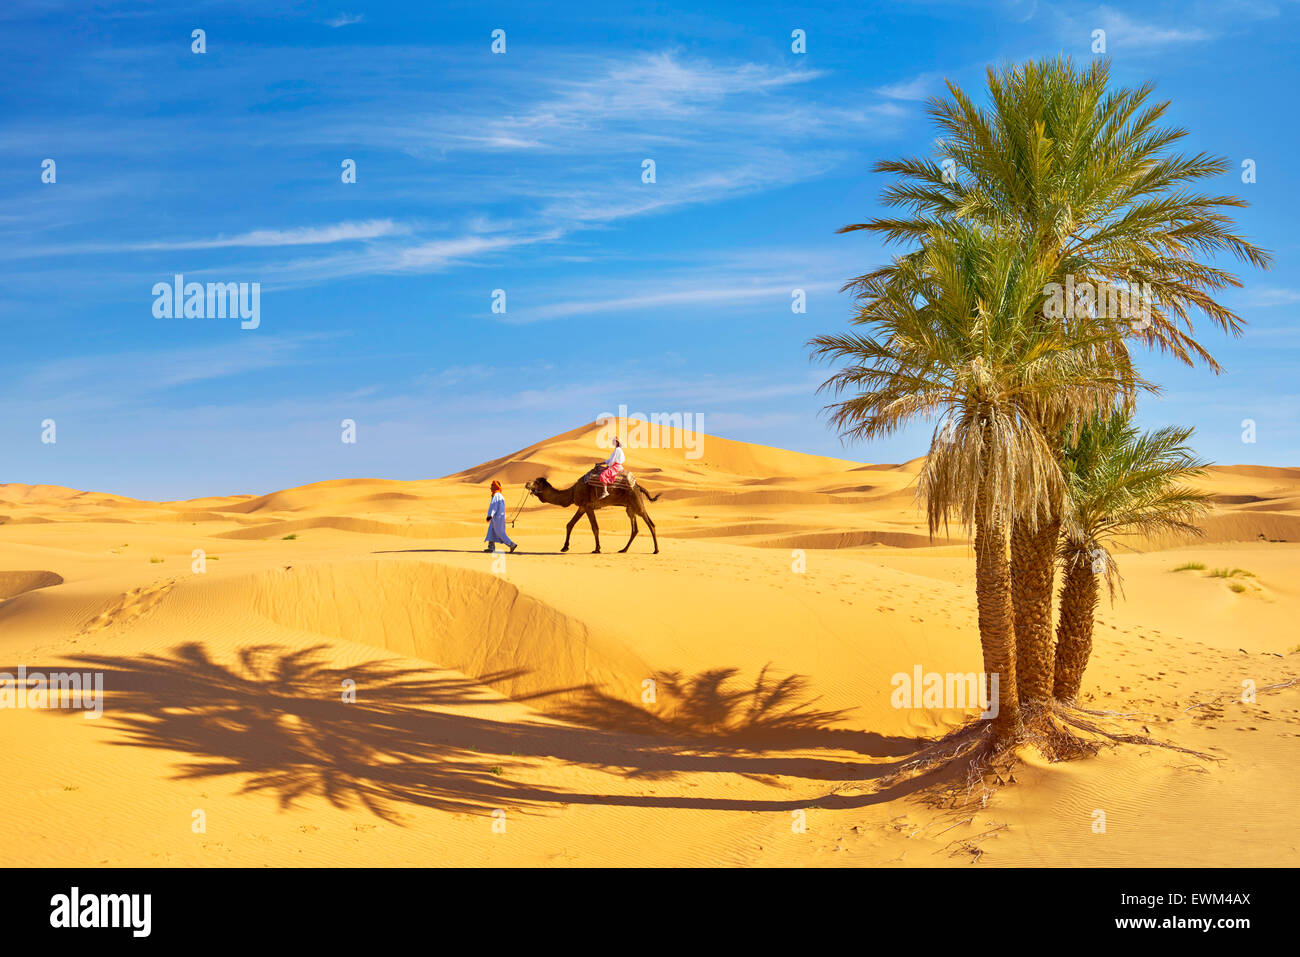 Tourist on camel ride, Erg Chebbi desert near Merzouga, Sahara, Morocco Stock Photo